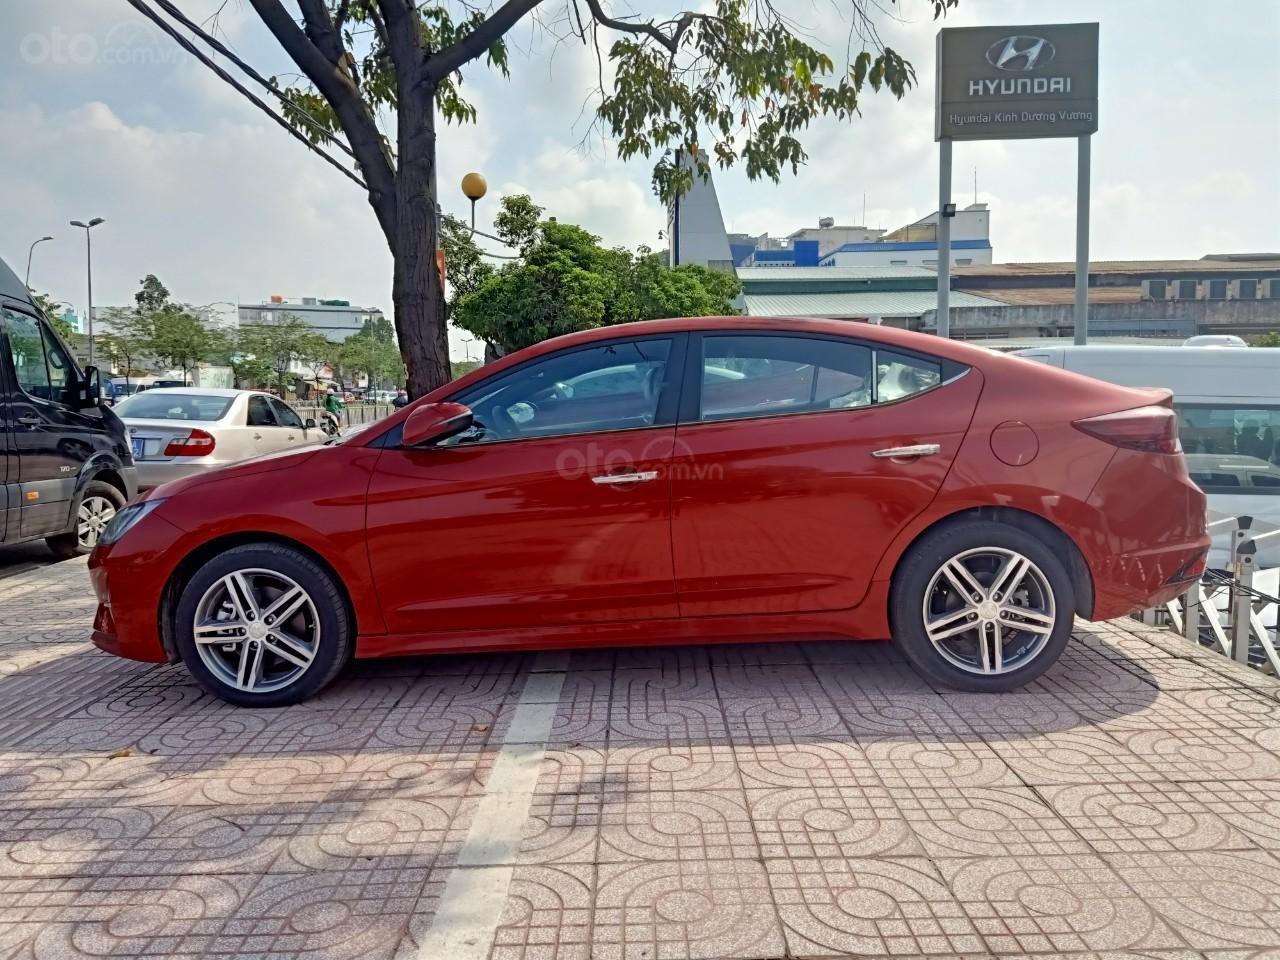 Hyundai Elantra 1.6AT Sport đỏ+ Sale sốc KM 40 triệu+ xe giao ngay (4)